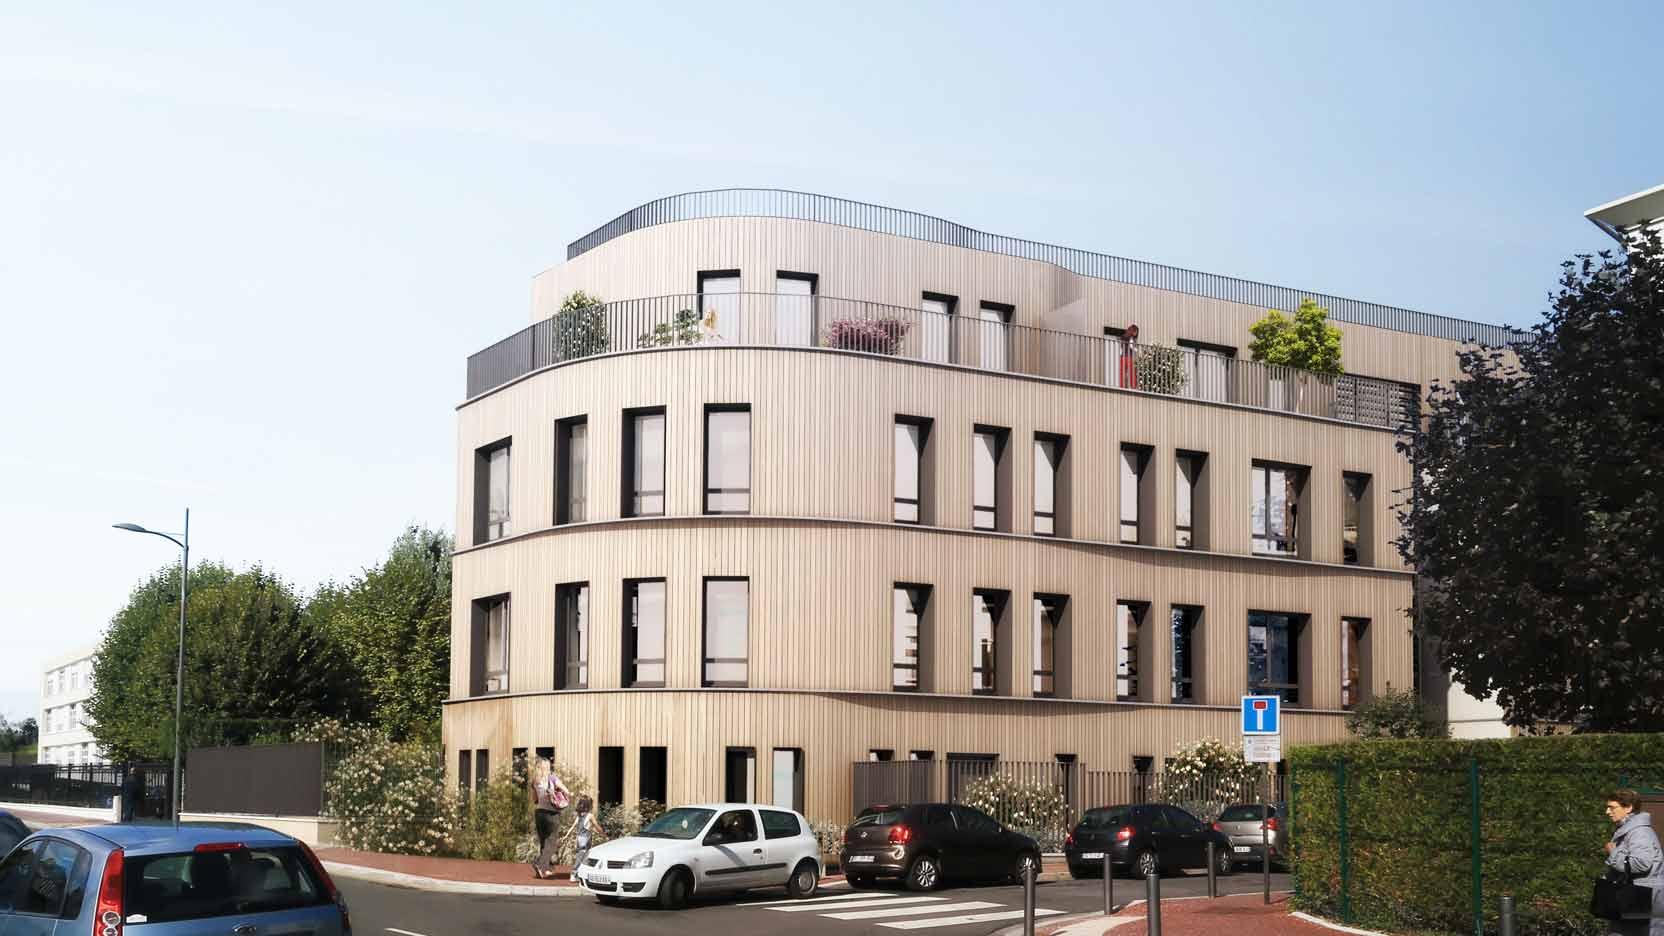 17 eco-friendly apartments in Enghien-les-Bains